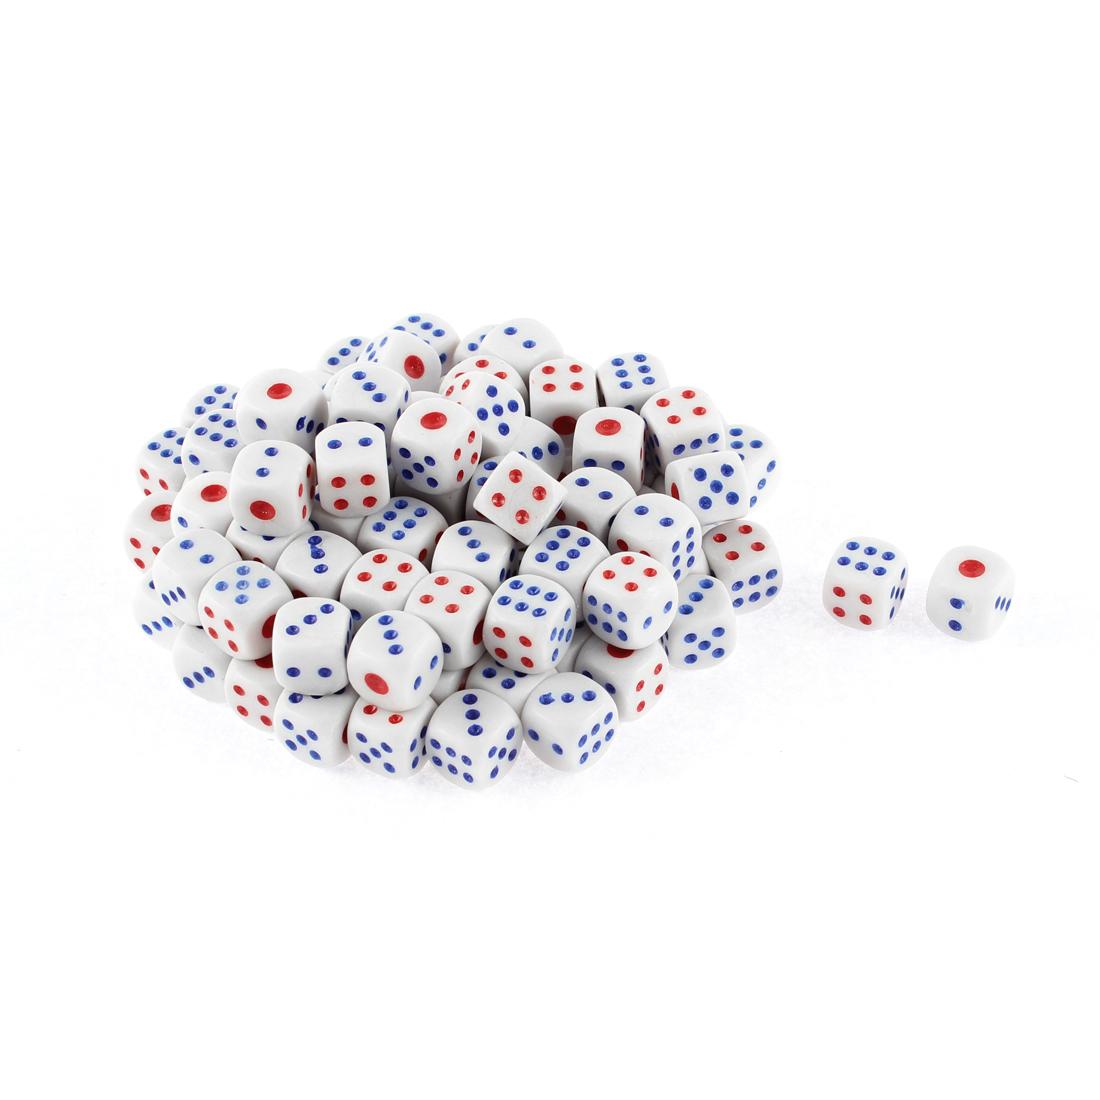 100 Pcs White Plastic Rounded Corner Gambling KTV Lucky Game Props Dices